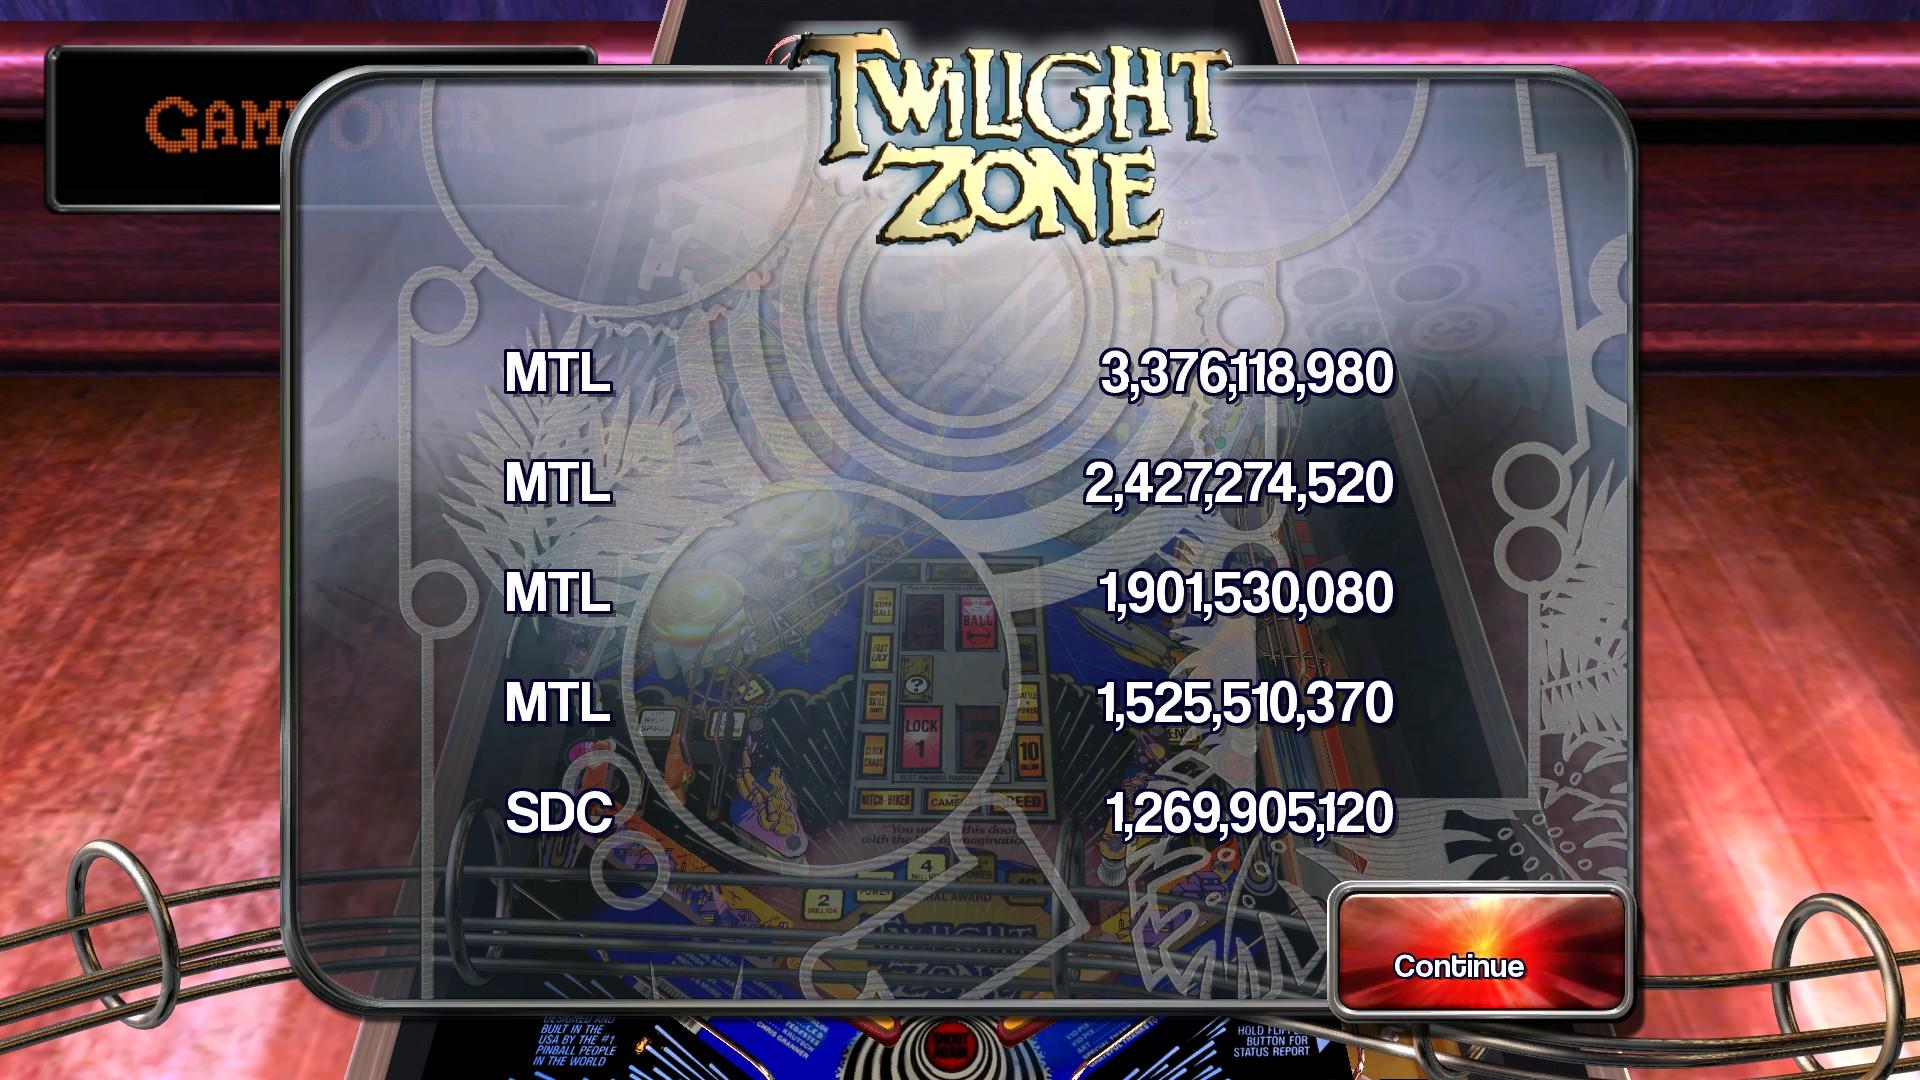 Mantalow: Pinball Arcade: Twilight Zone (PC) 3,376,118,980 points on 2016-04-20 07:42:22